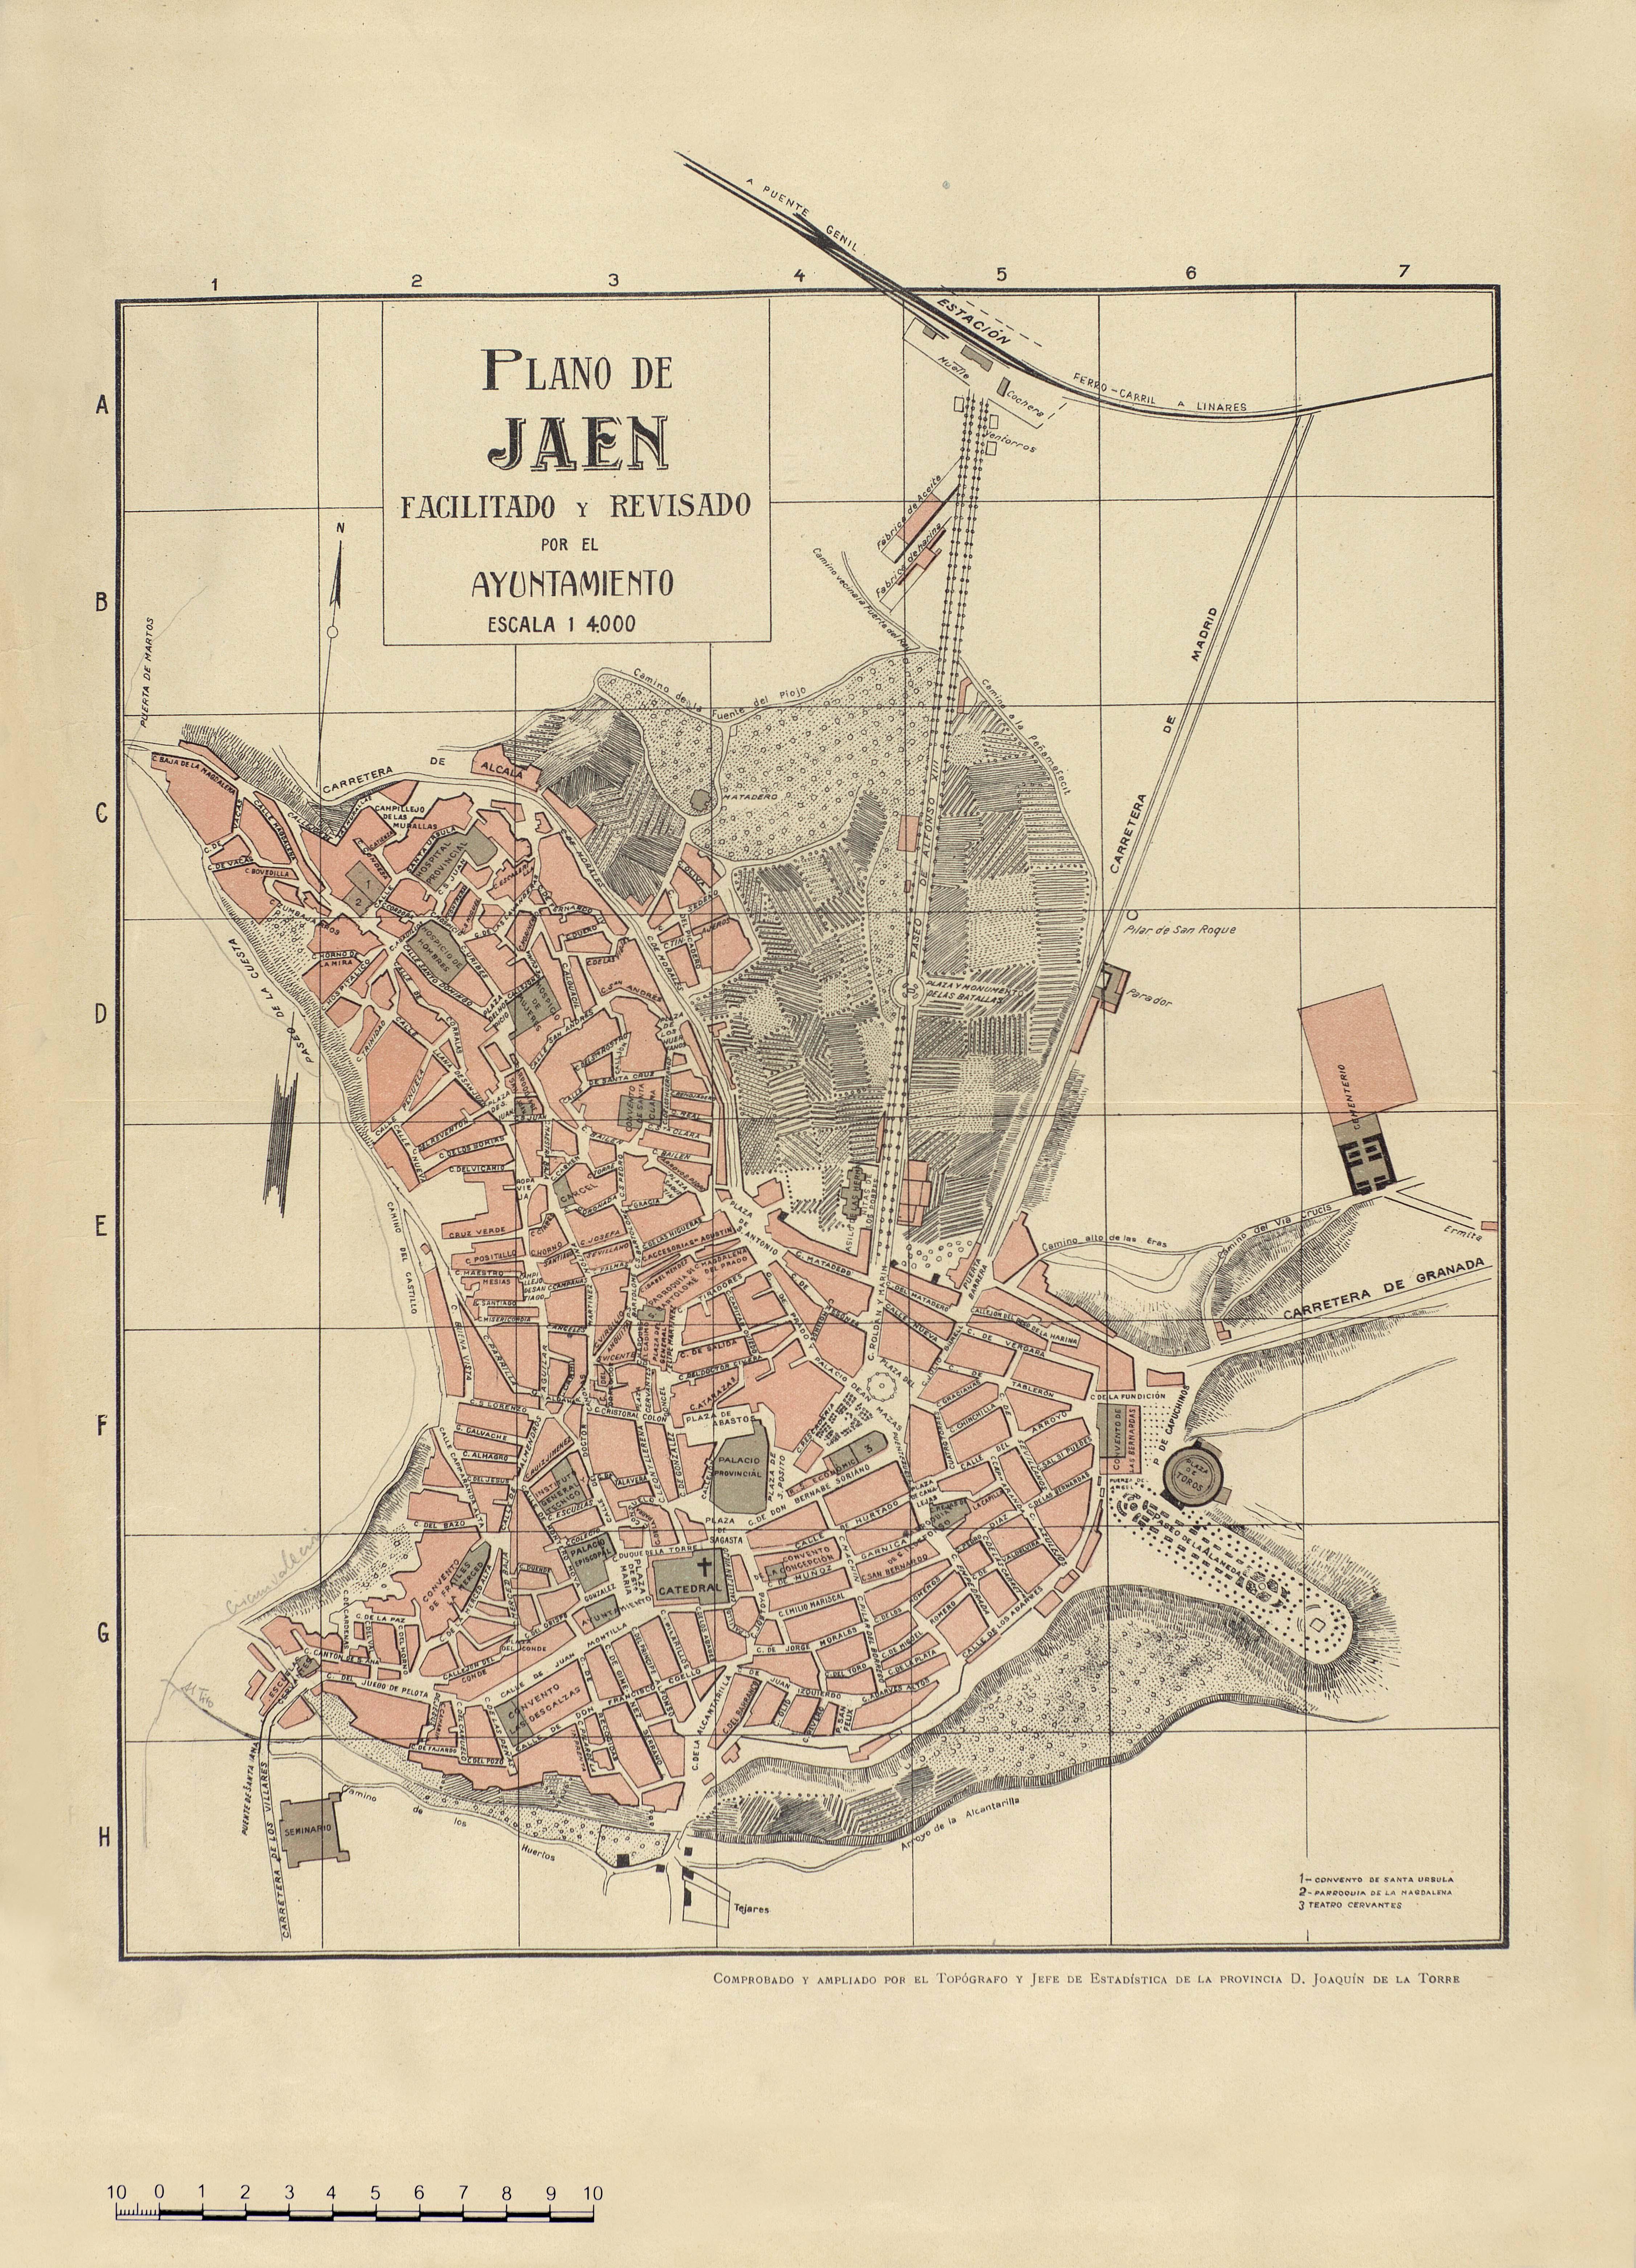 Plano de Jaén